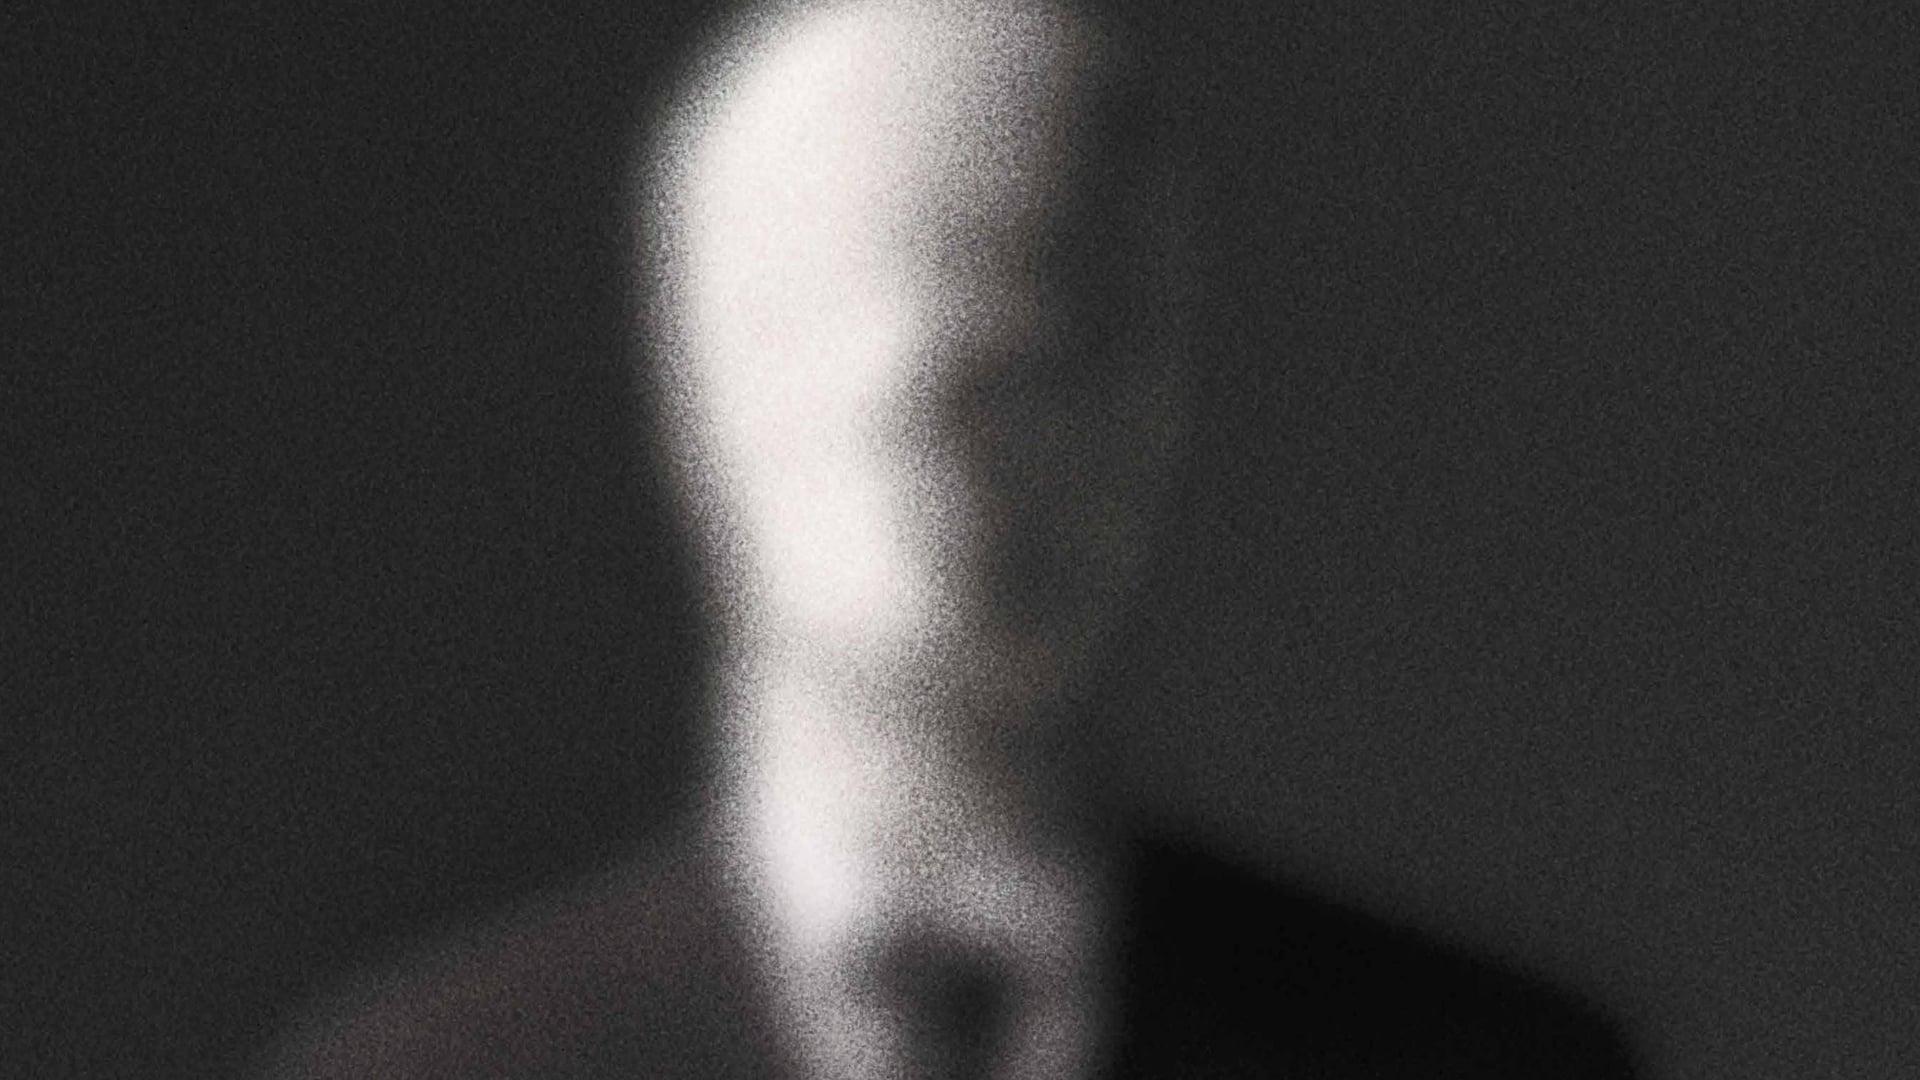 Watch Slender Man 2018 Full Movie At Amc Movies Com